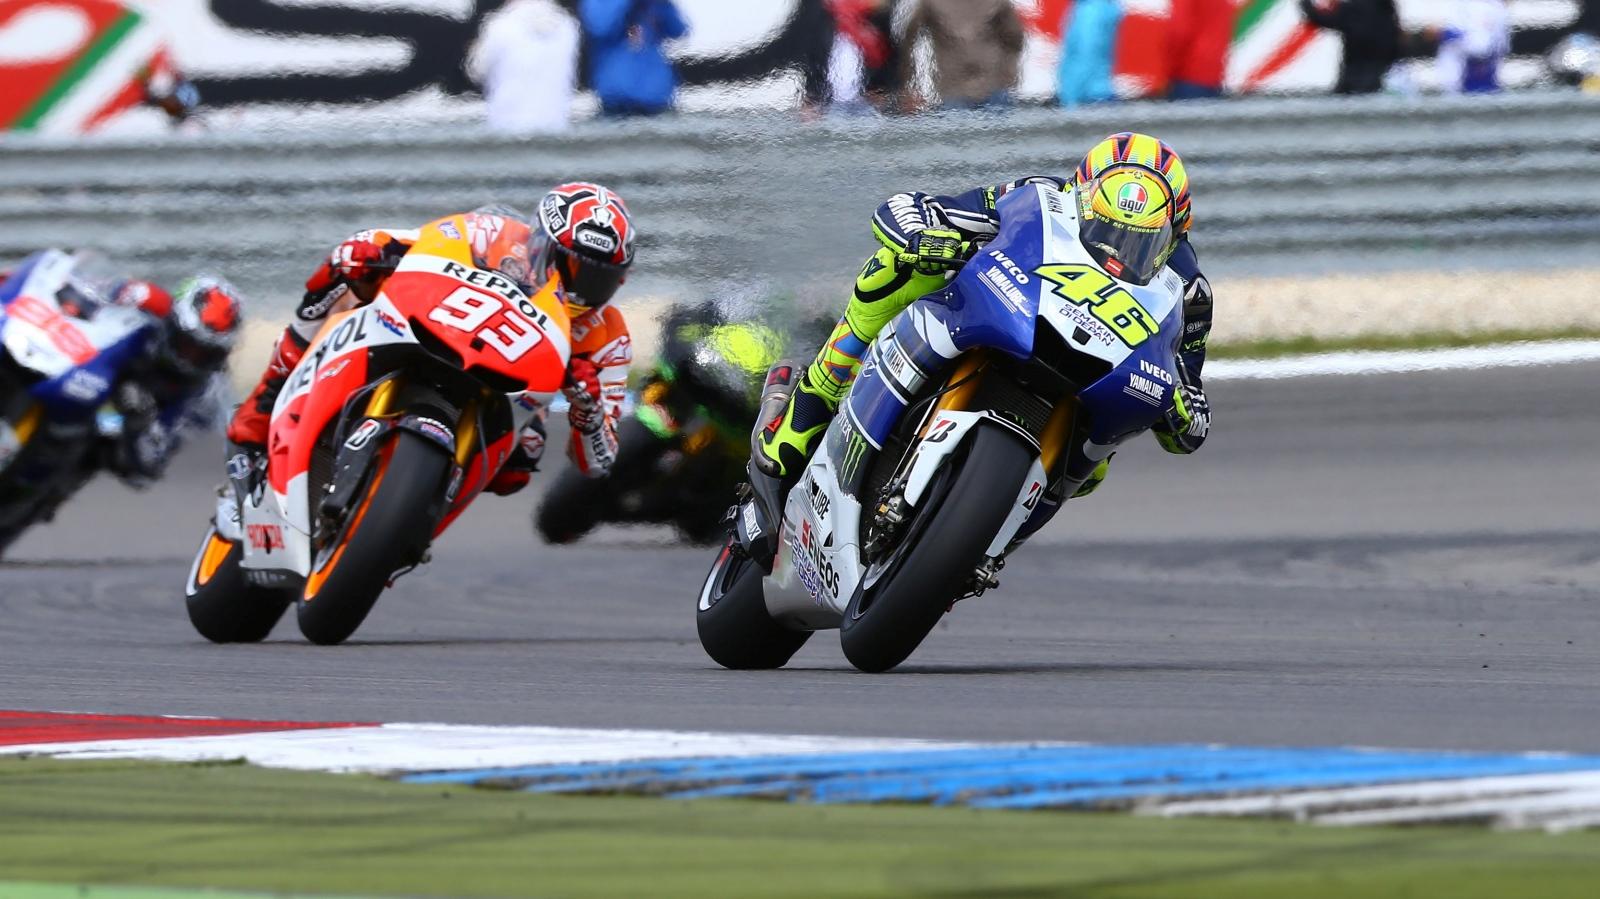 25 años Valentino Rossi: 2013 – 4º MotoGP – Yamaha YZR-M1 / Yamaha Factory Racing